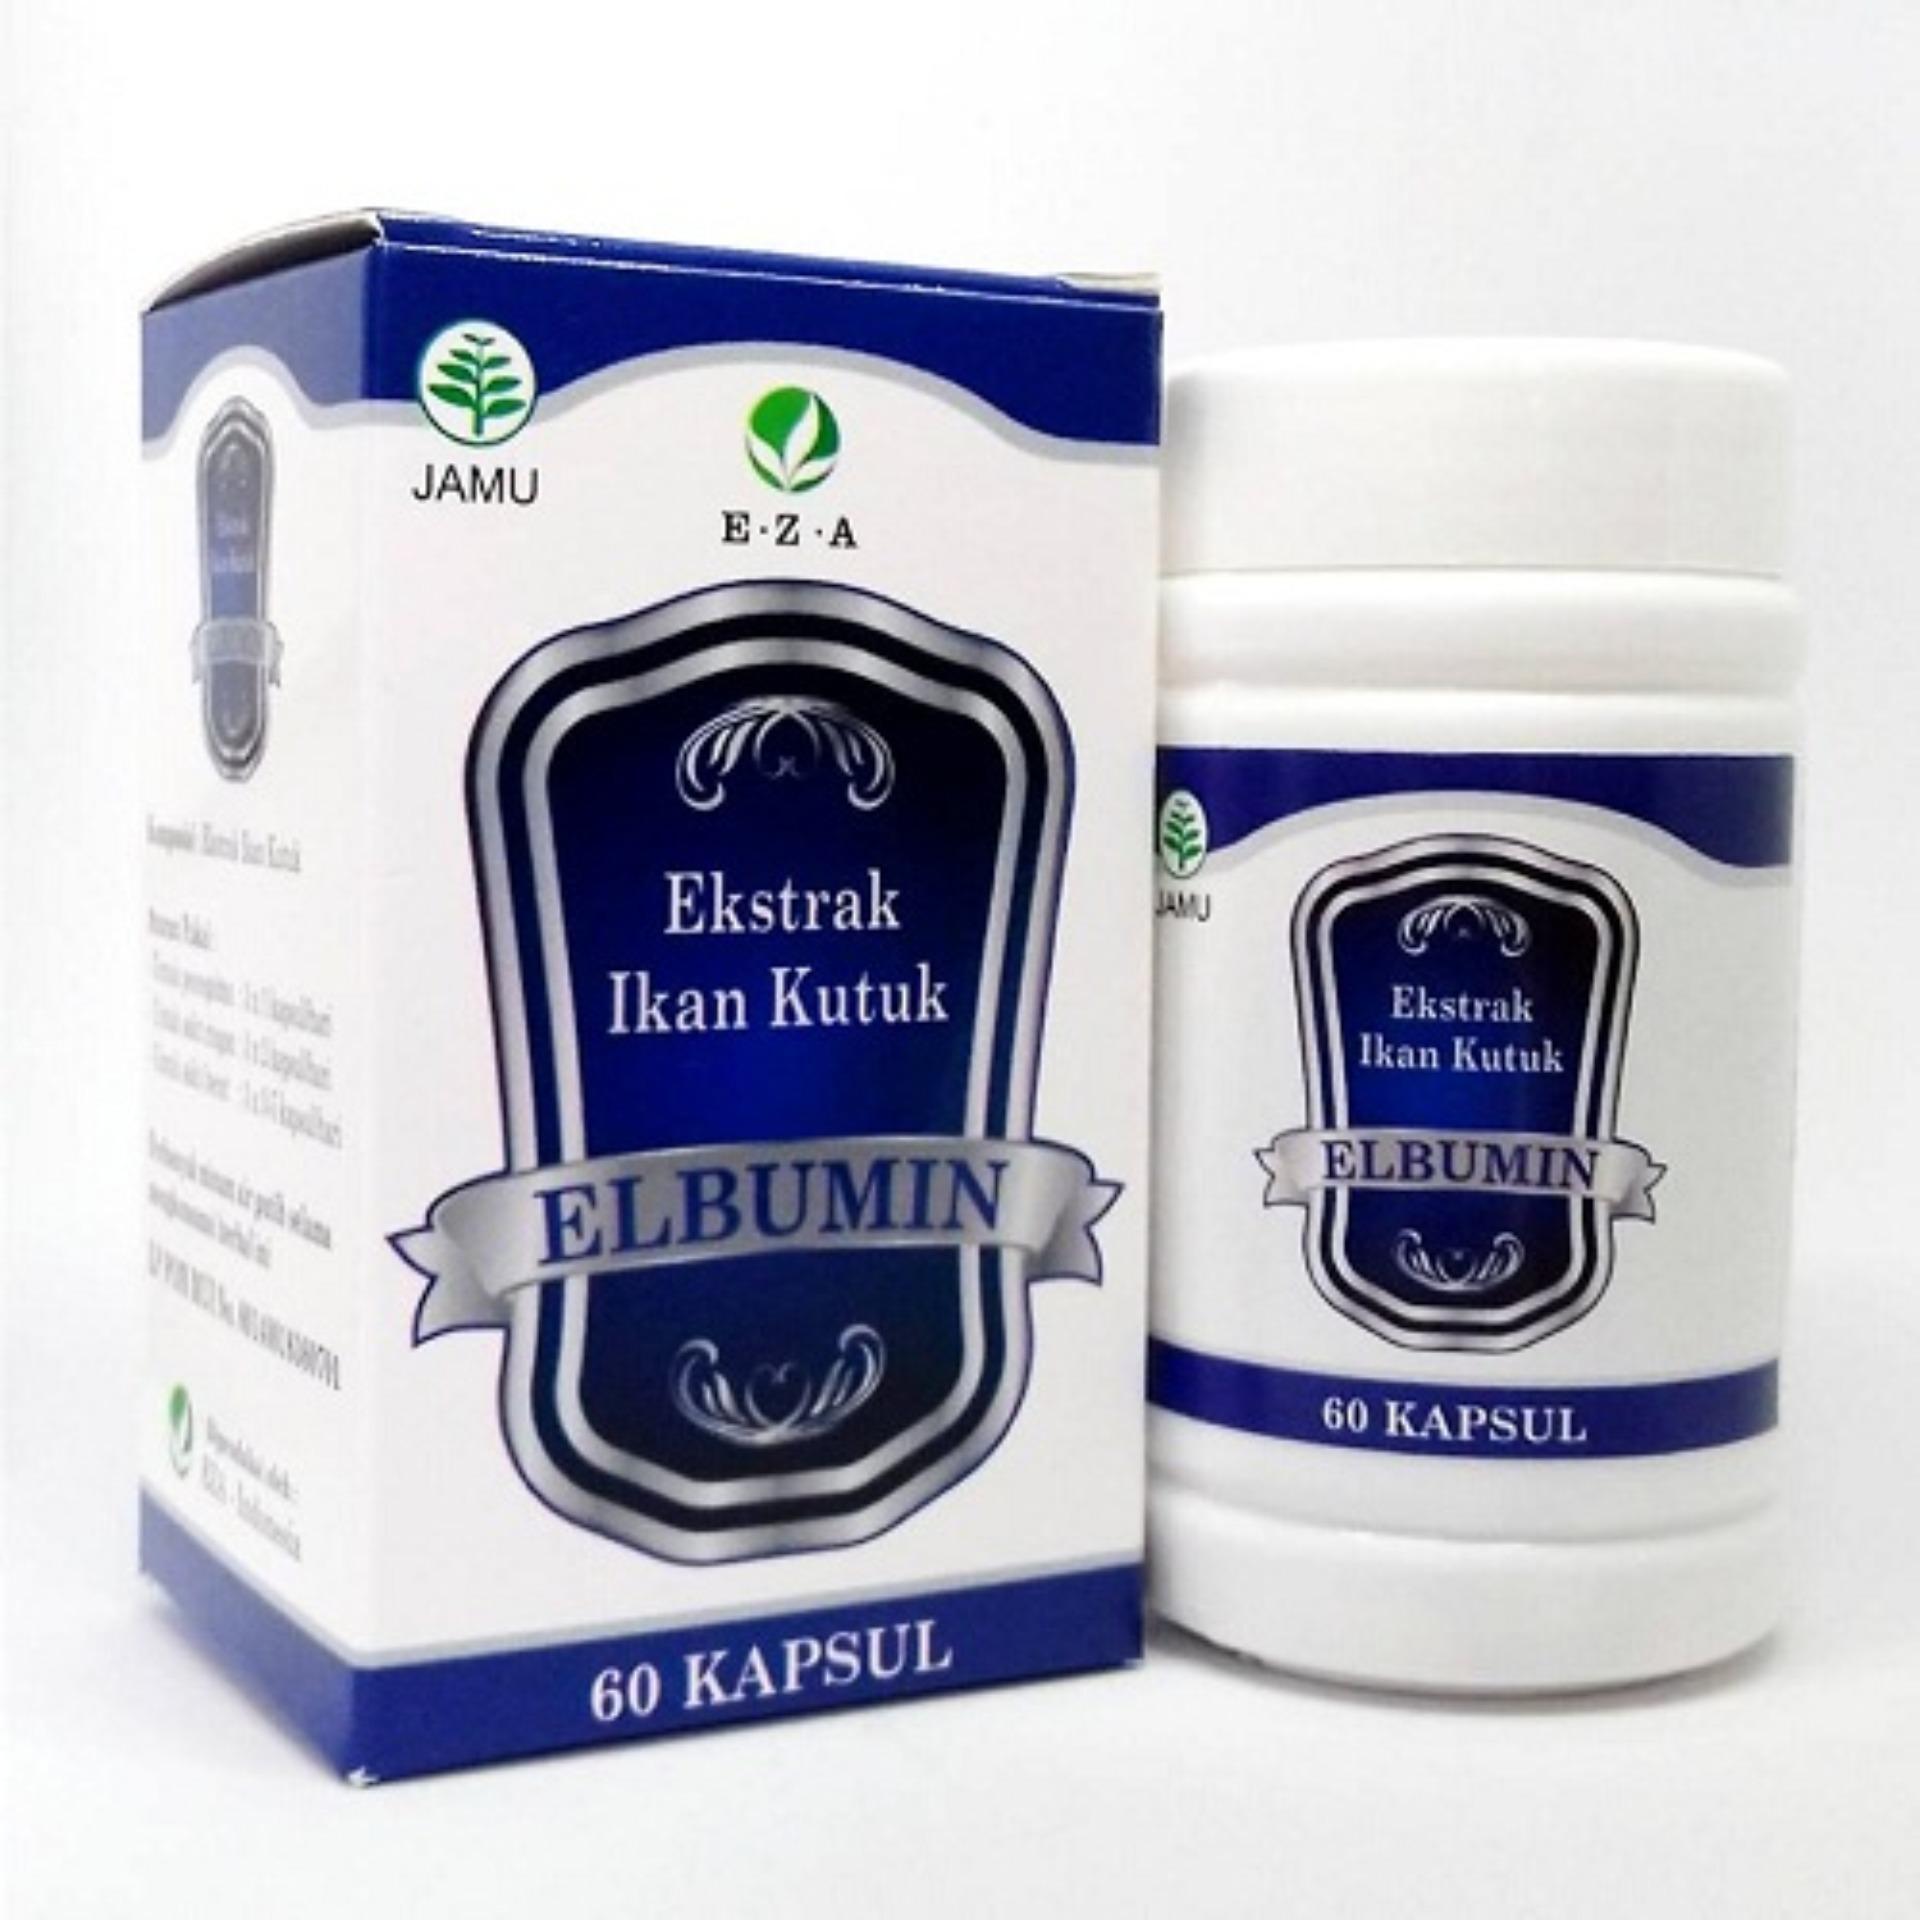 Ash Shihhah Kapsul Ekstrak Ikan Kutuk Pro Albumin 60kapsul Daftar Green Coffee Extract Ashsihah Original Elbumin